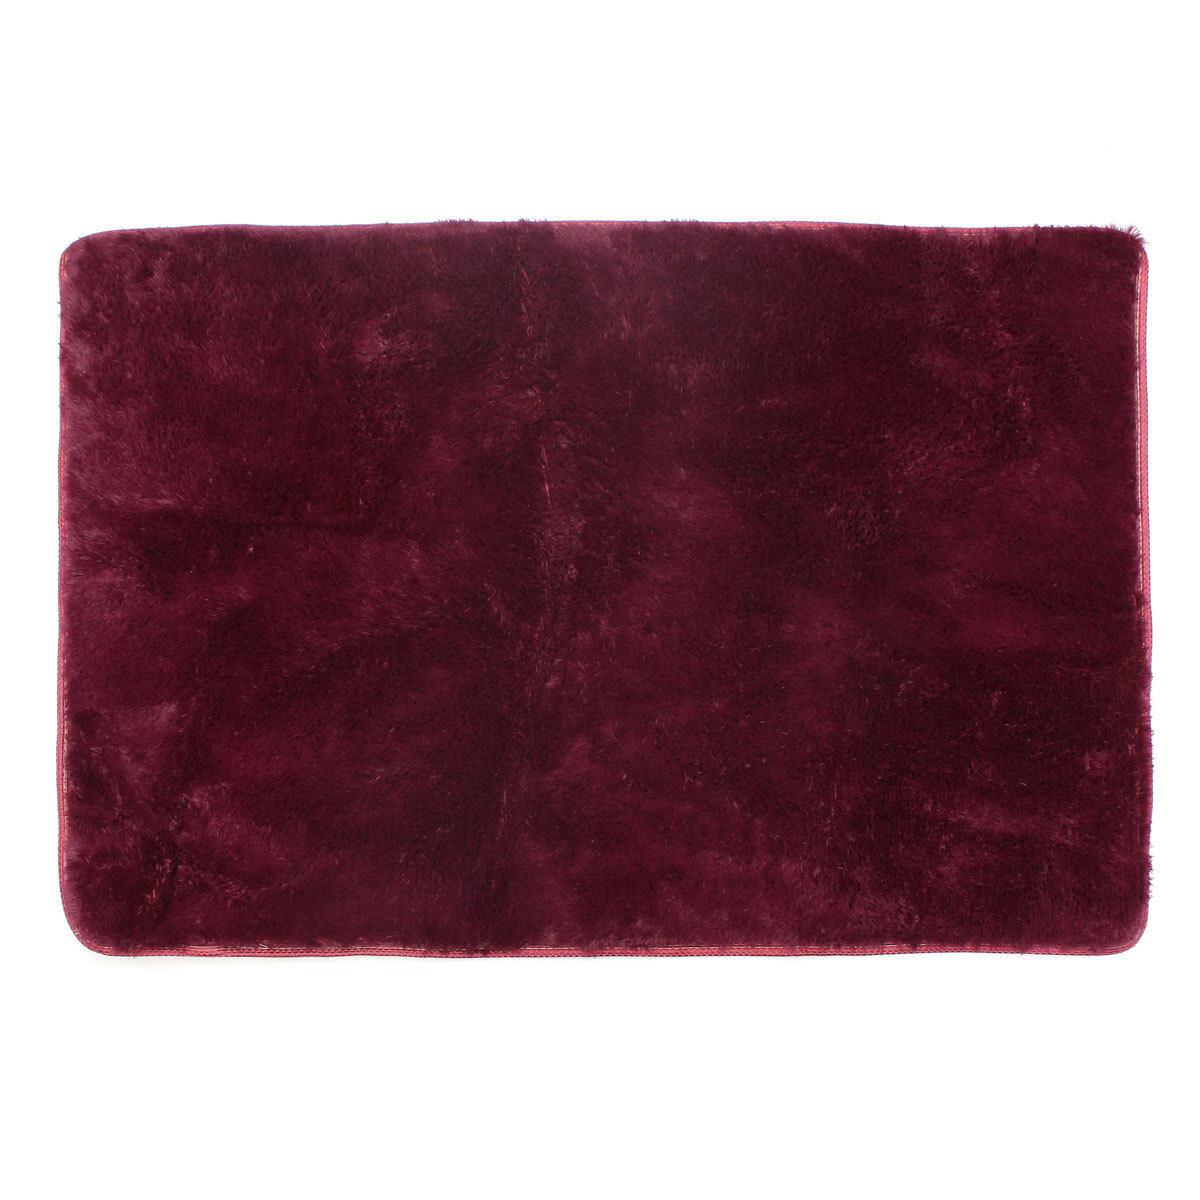 ... Shaggy Anti-skid Carpets Rugs Floor Mat/Cover 80*120cm Claret-Red ...